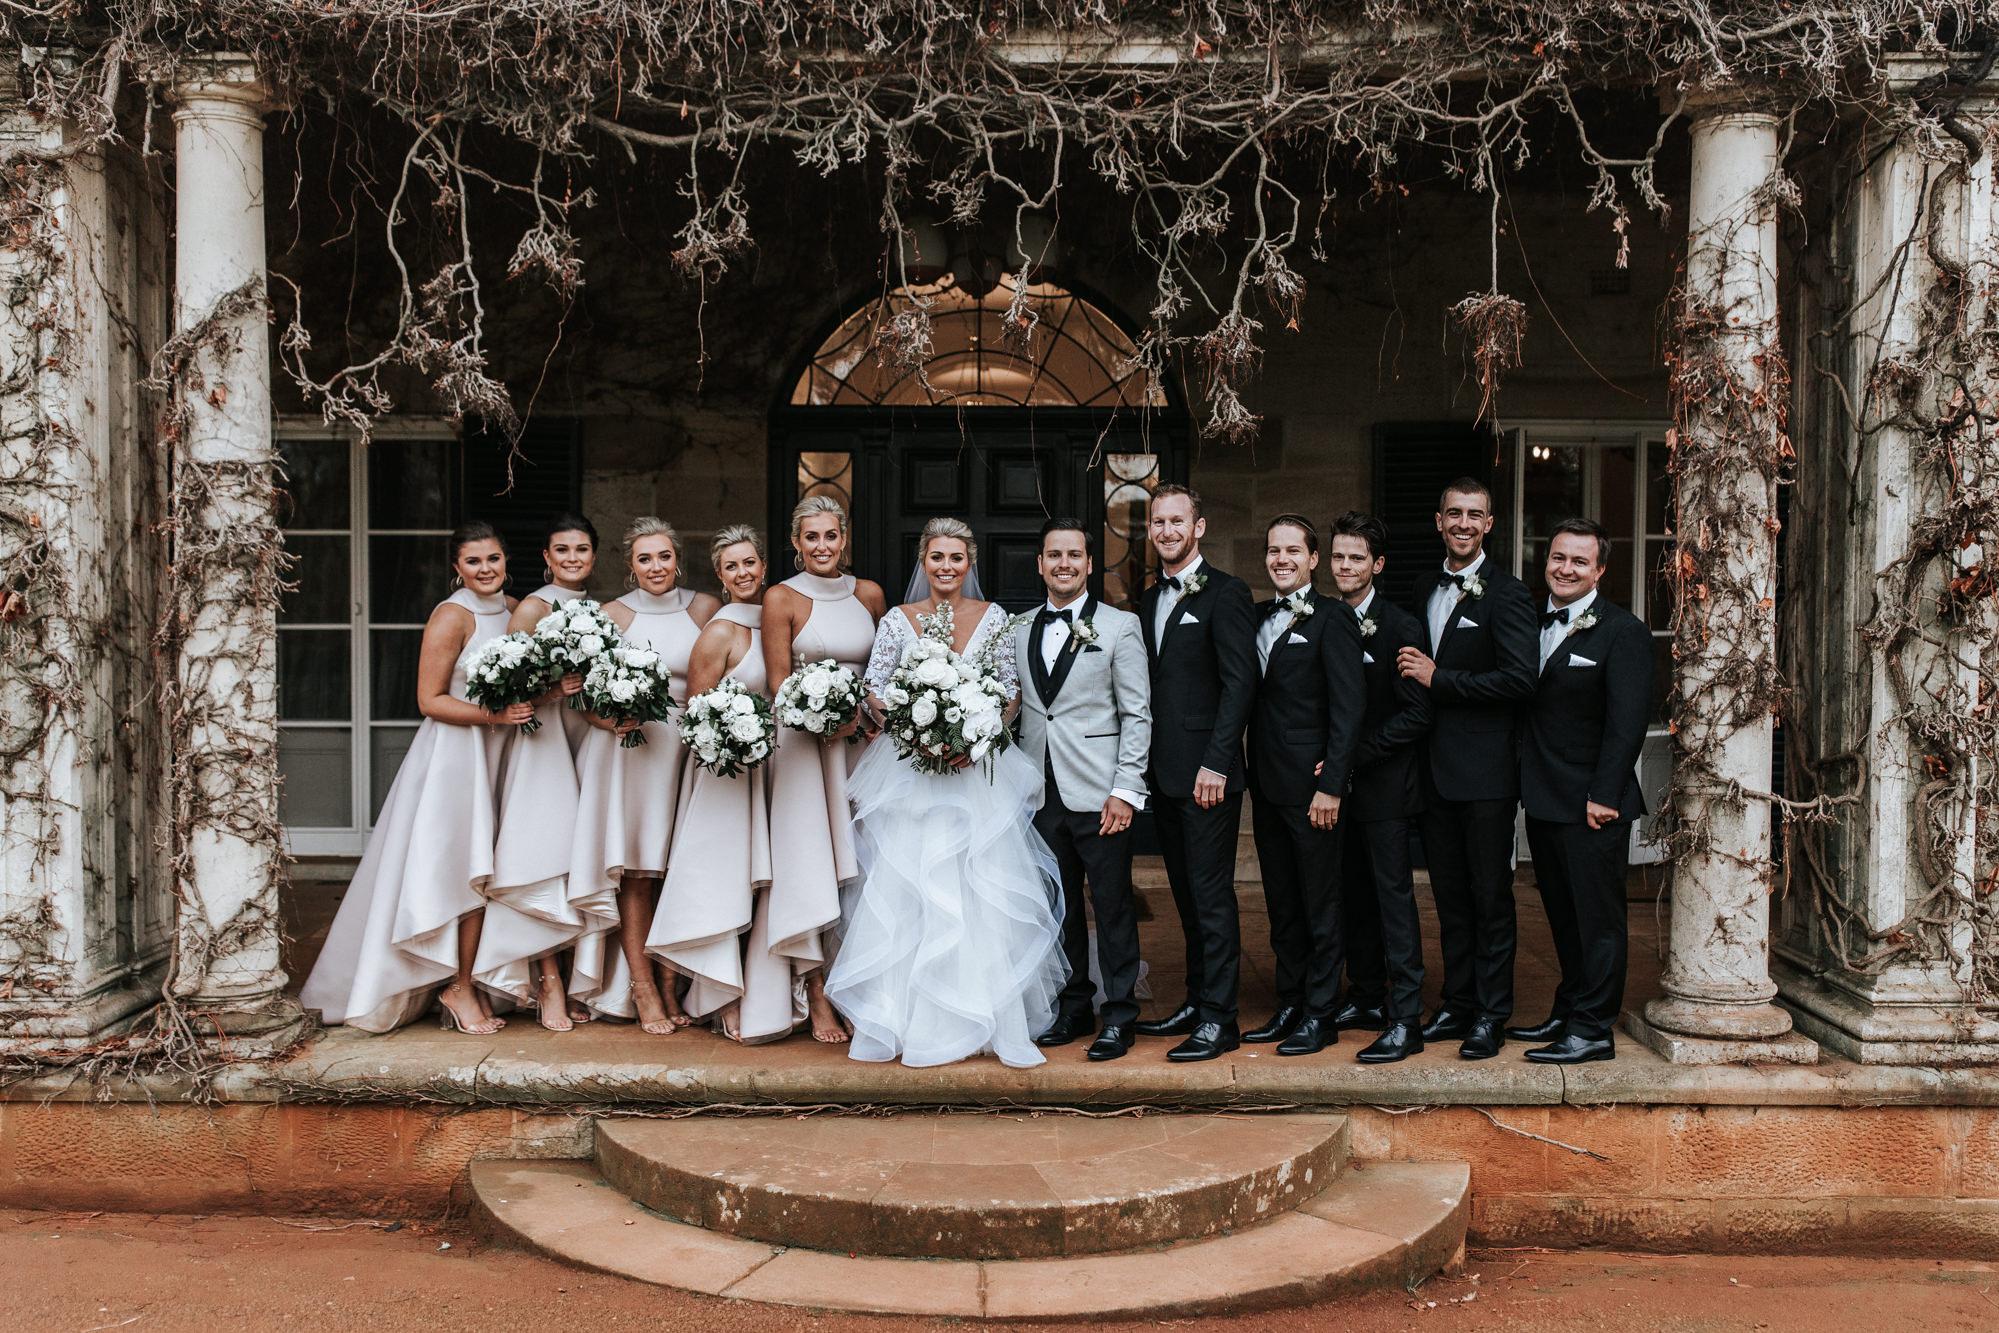 bendooley-estate-wedding-alyce-wil-5.jpg